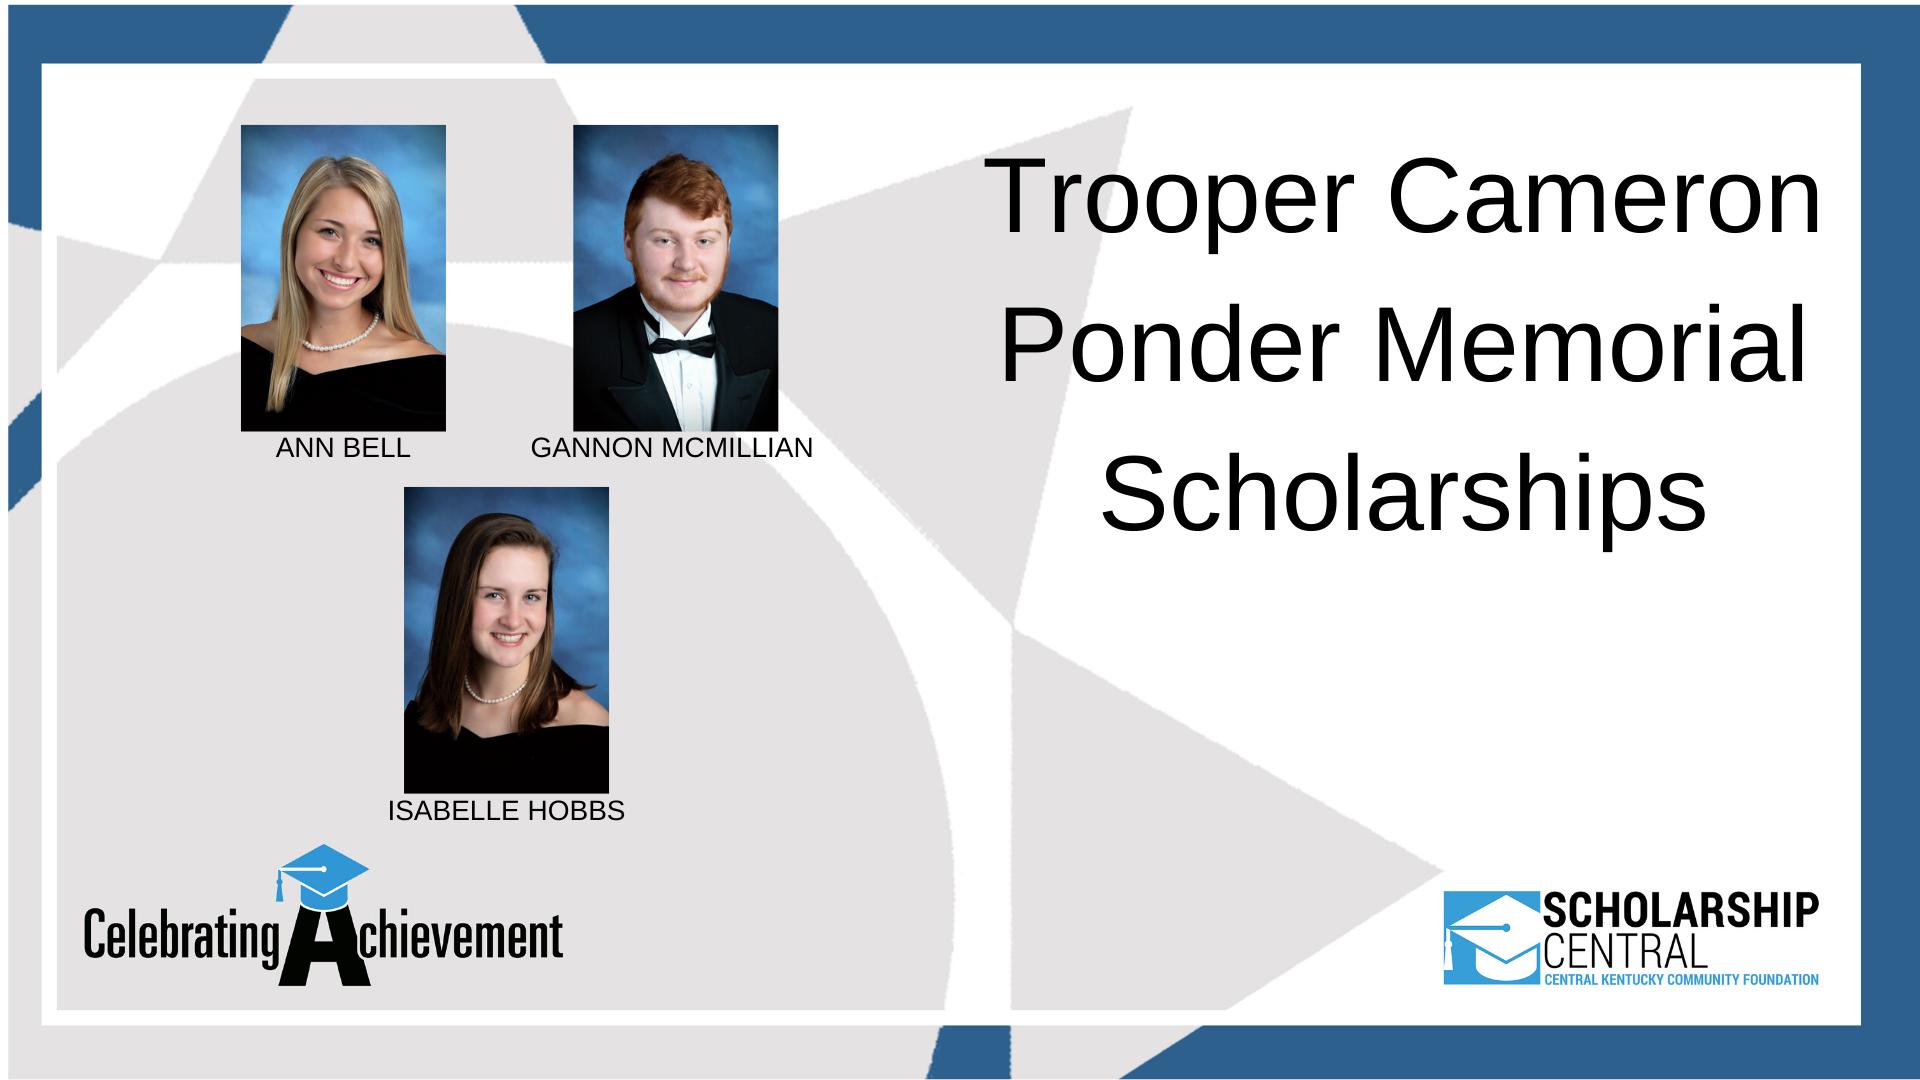 Trooper Cameron Ponder Scholarship1